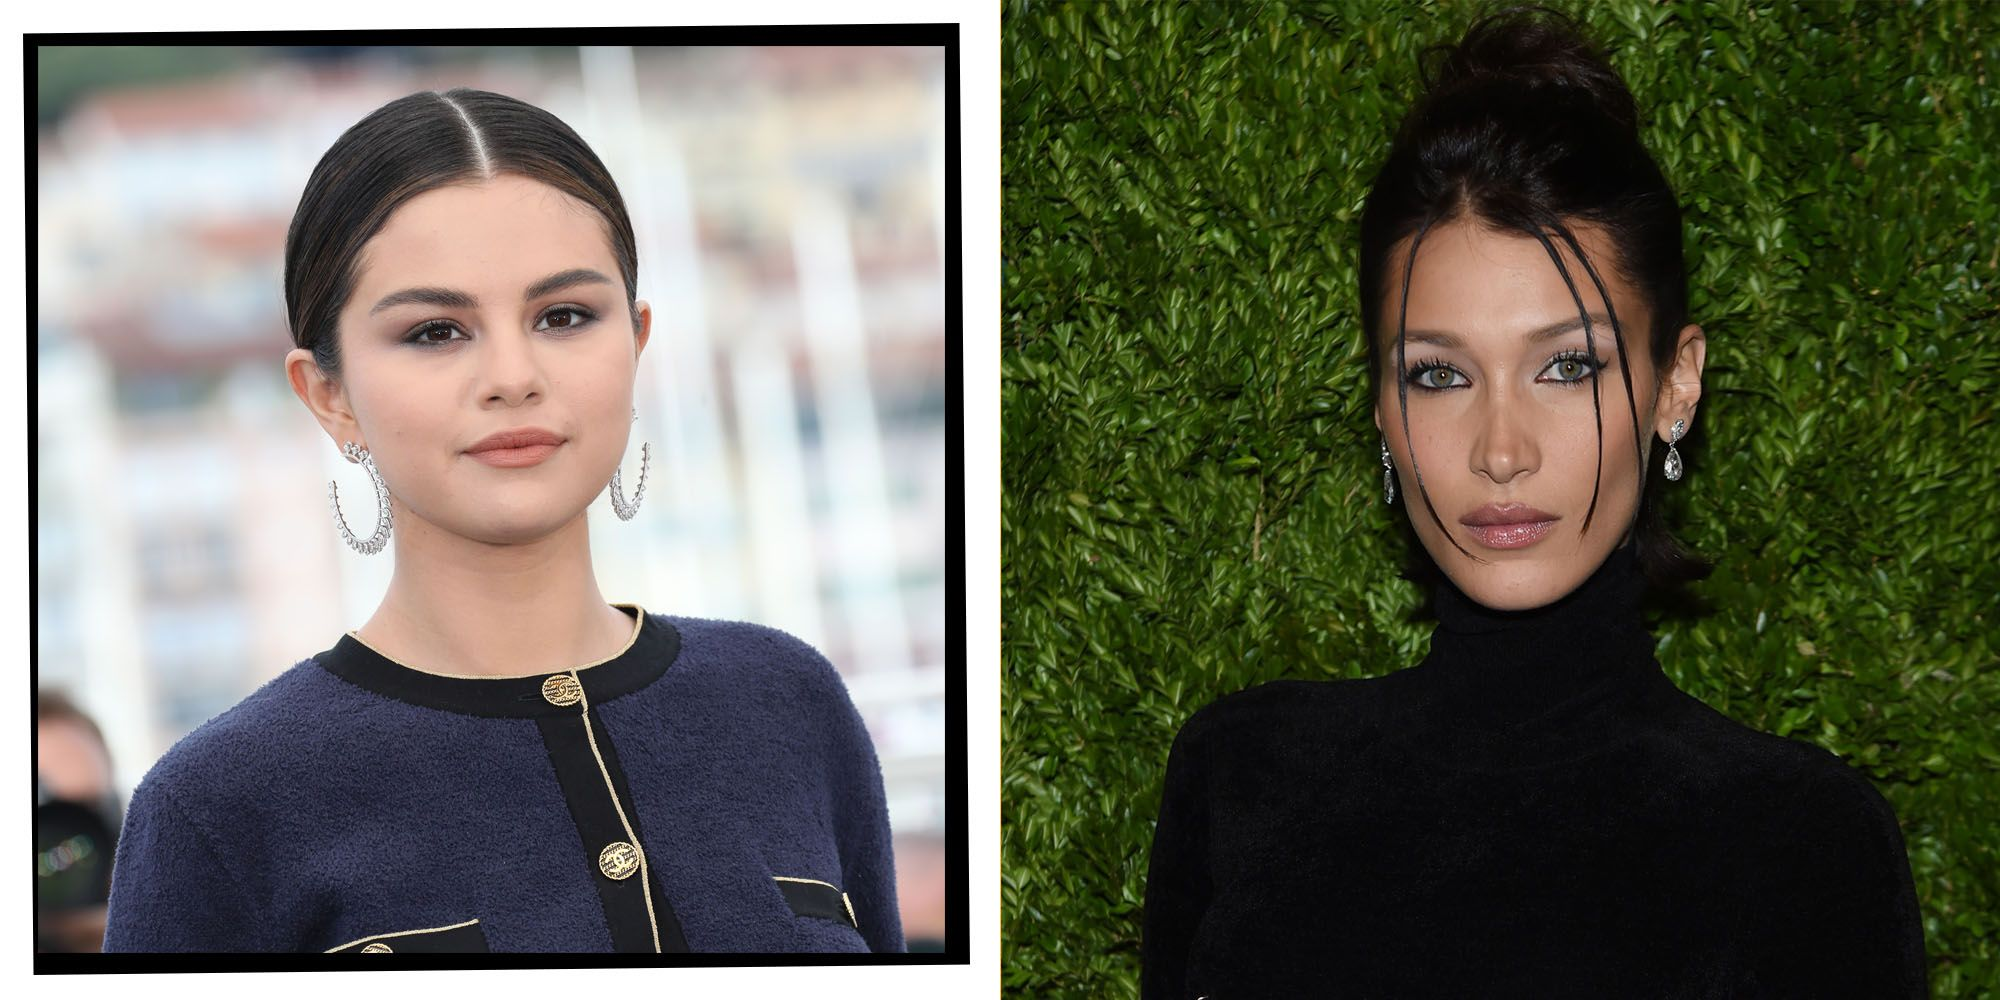 Selena Gomez Shuts Down Bella Hadid Feud Rumours With Passionate Instagram Plea